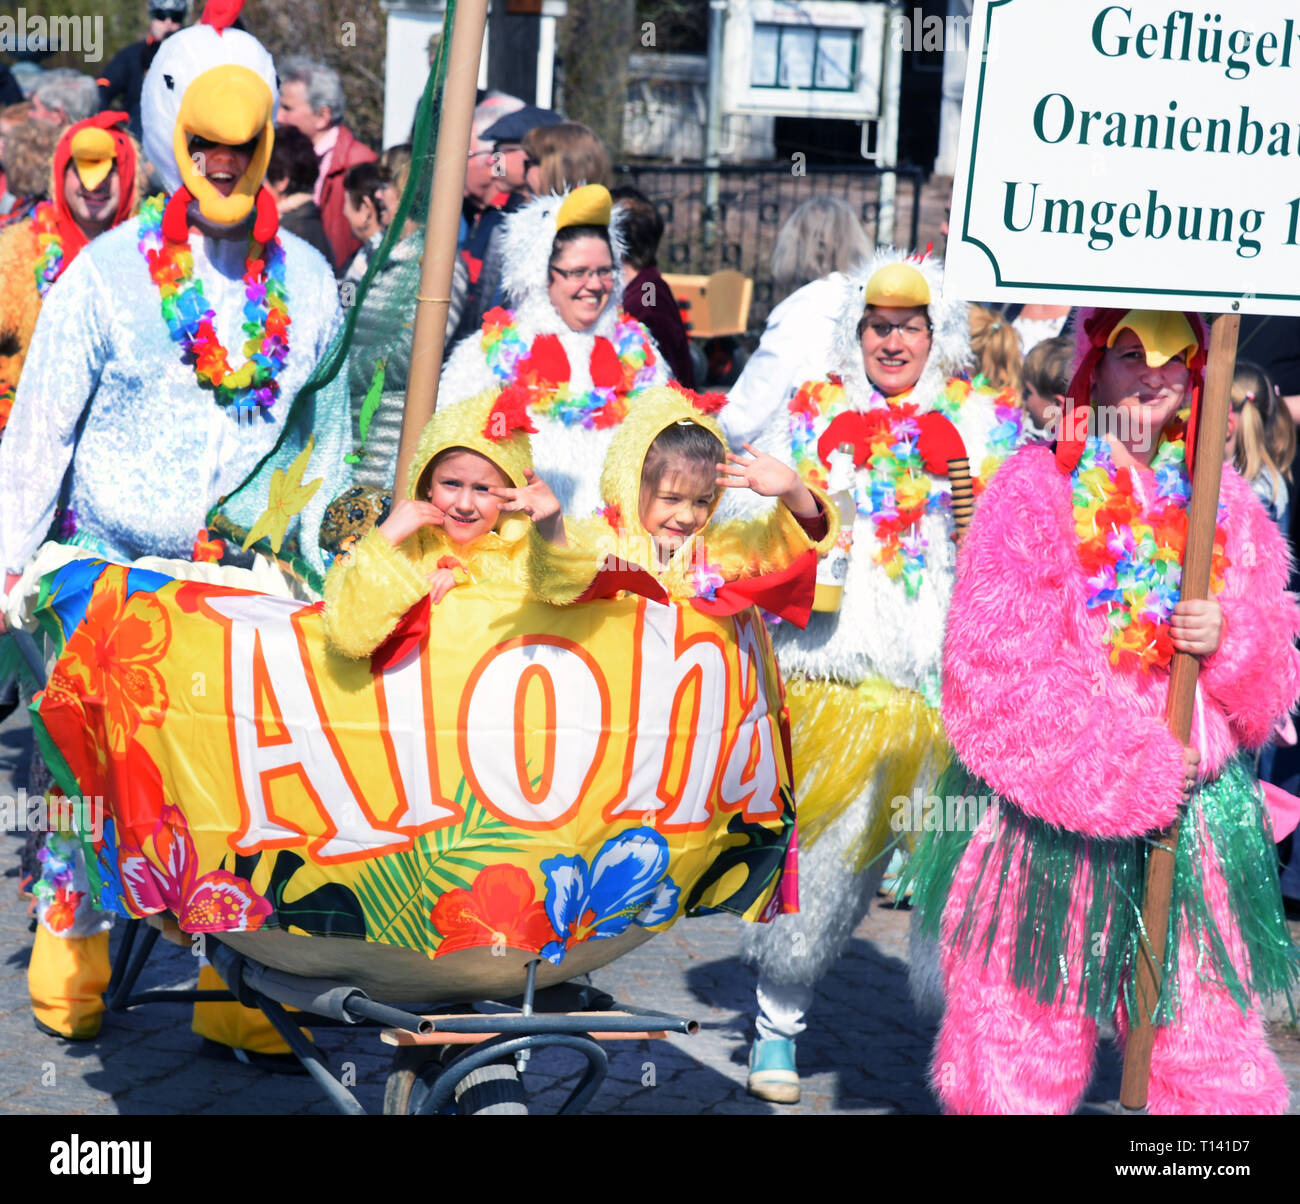 Spring Awakening Festival 2020 23 March 2020, Saxony Anhalt, Wörlitz: The costumed Wörlitz